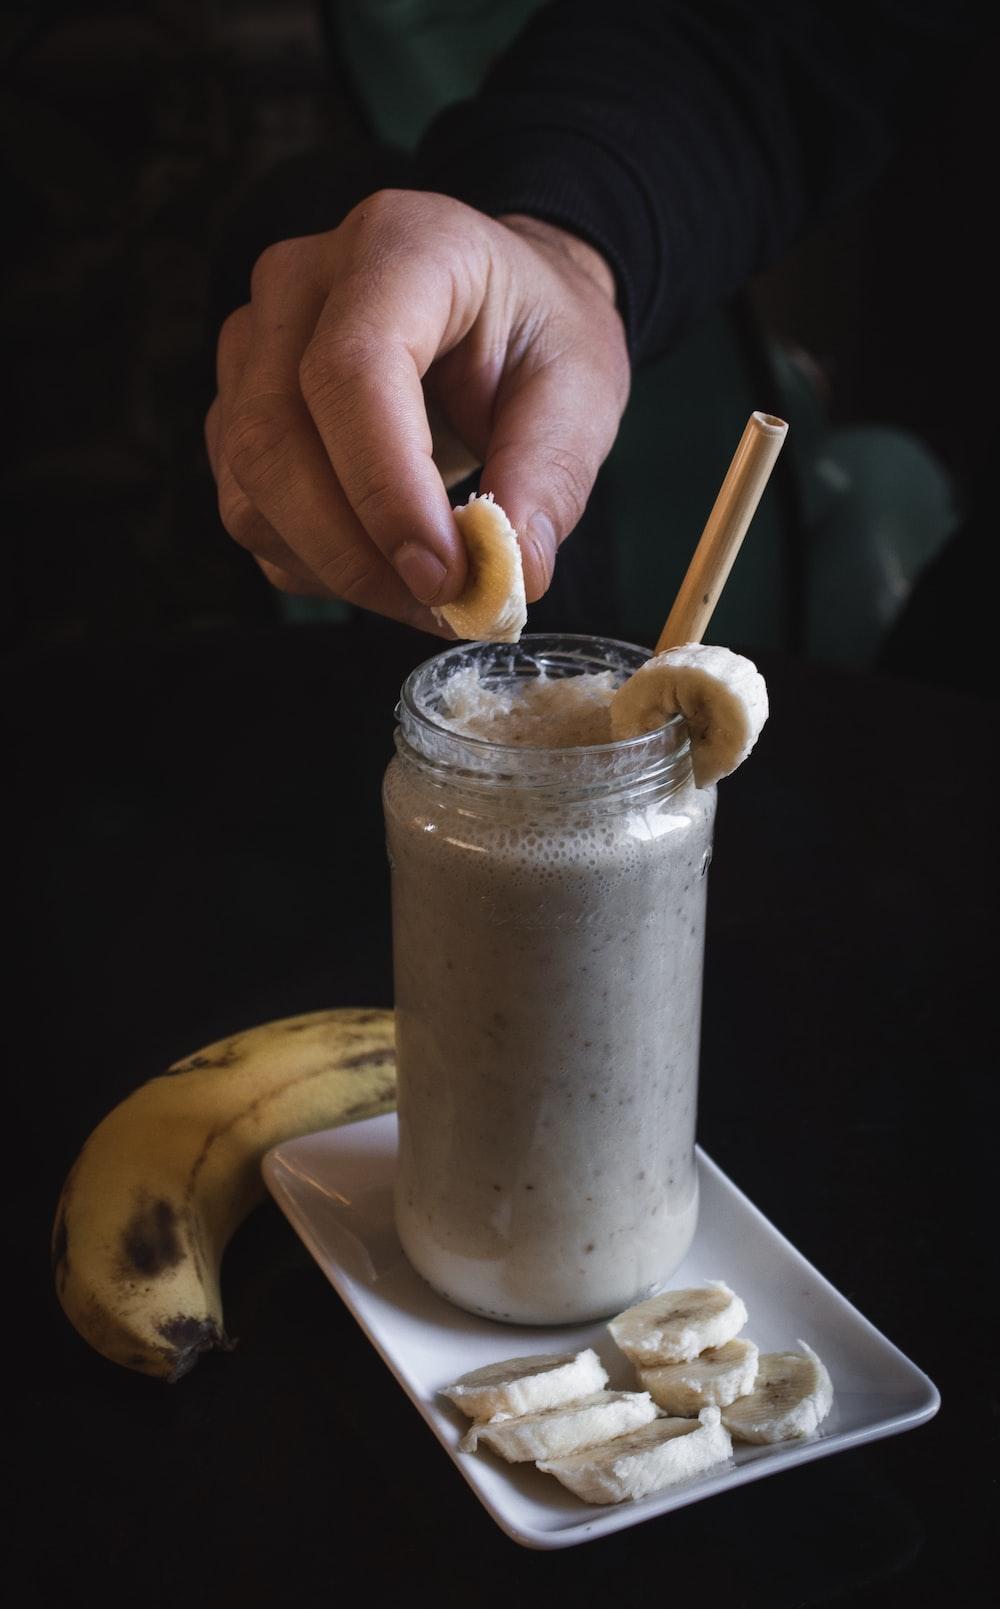 person holding slice of banana on fruit shake har